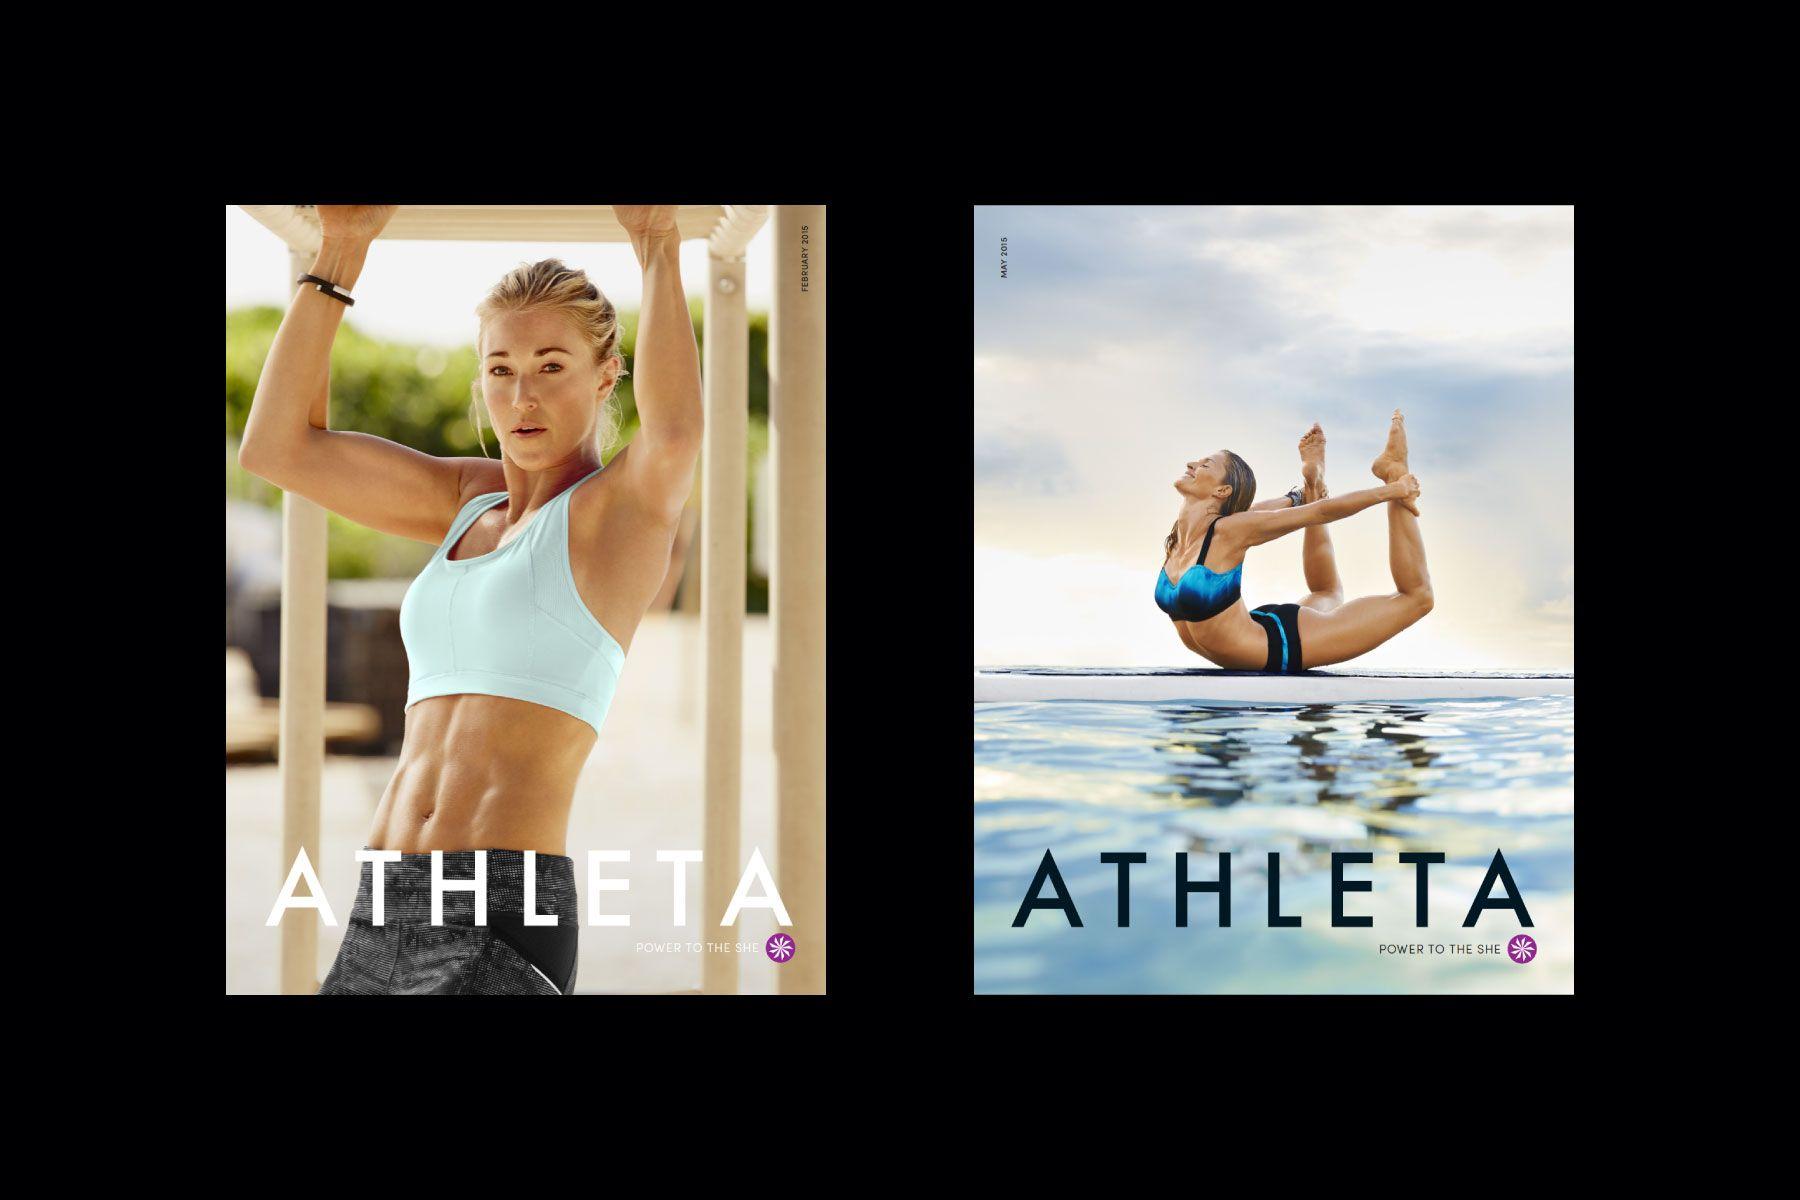 Athleta-Opening-Images2.jpg